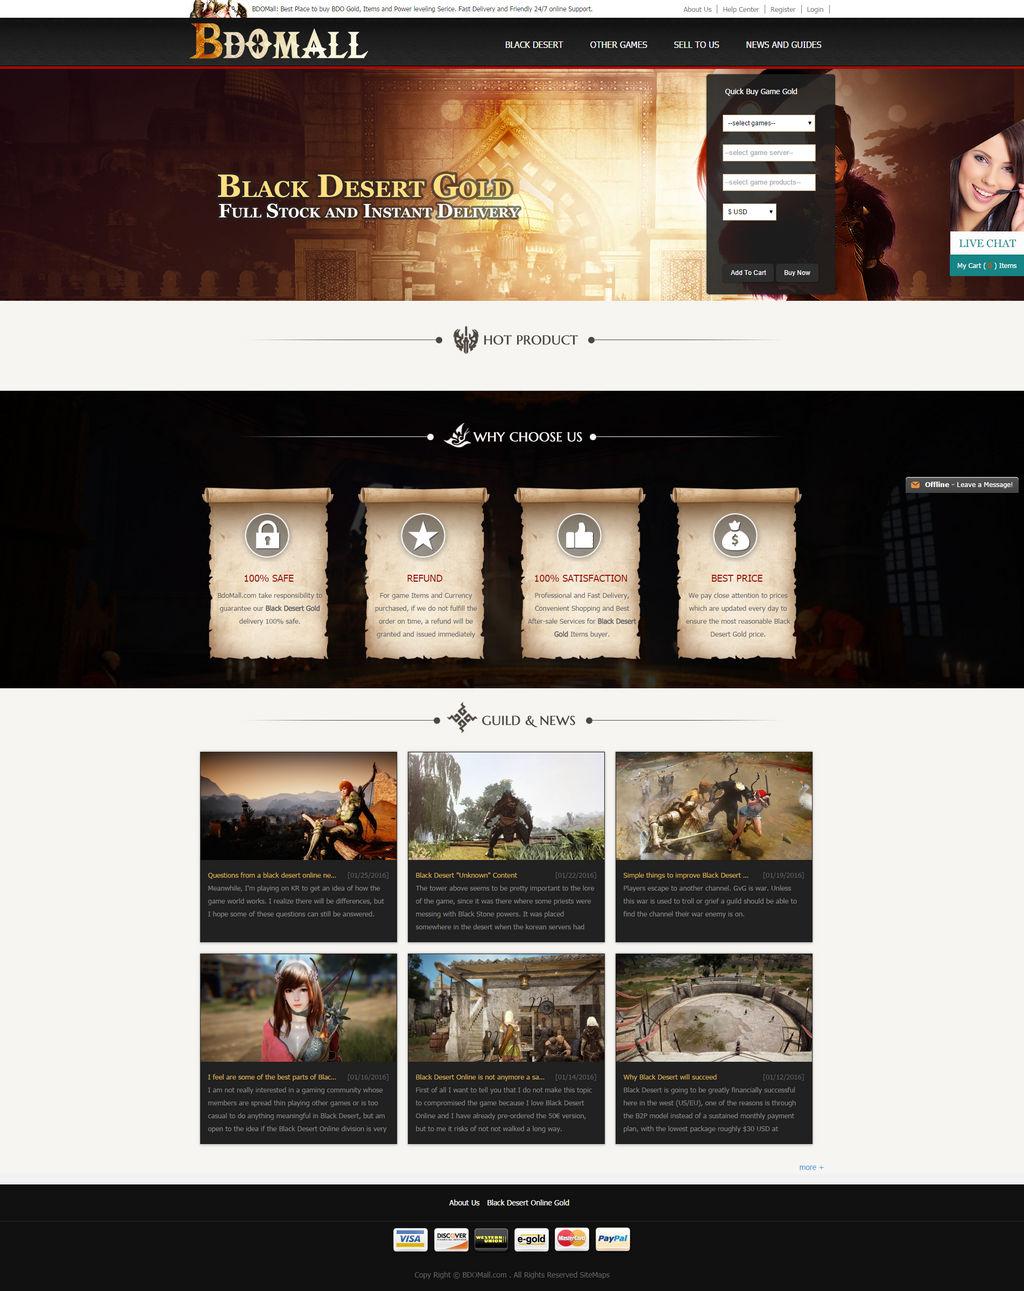 BDOMall Best Place To Buy Black Desert Gold, BDO by bdomall